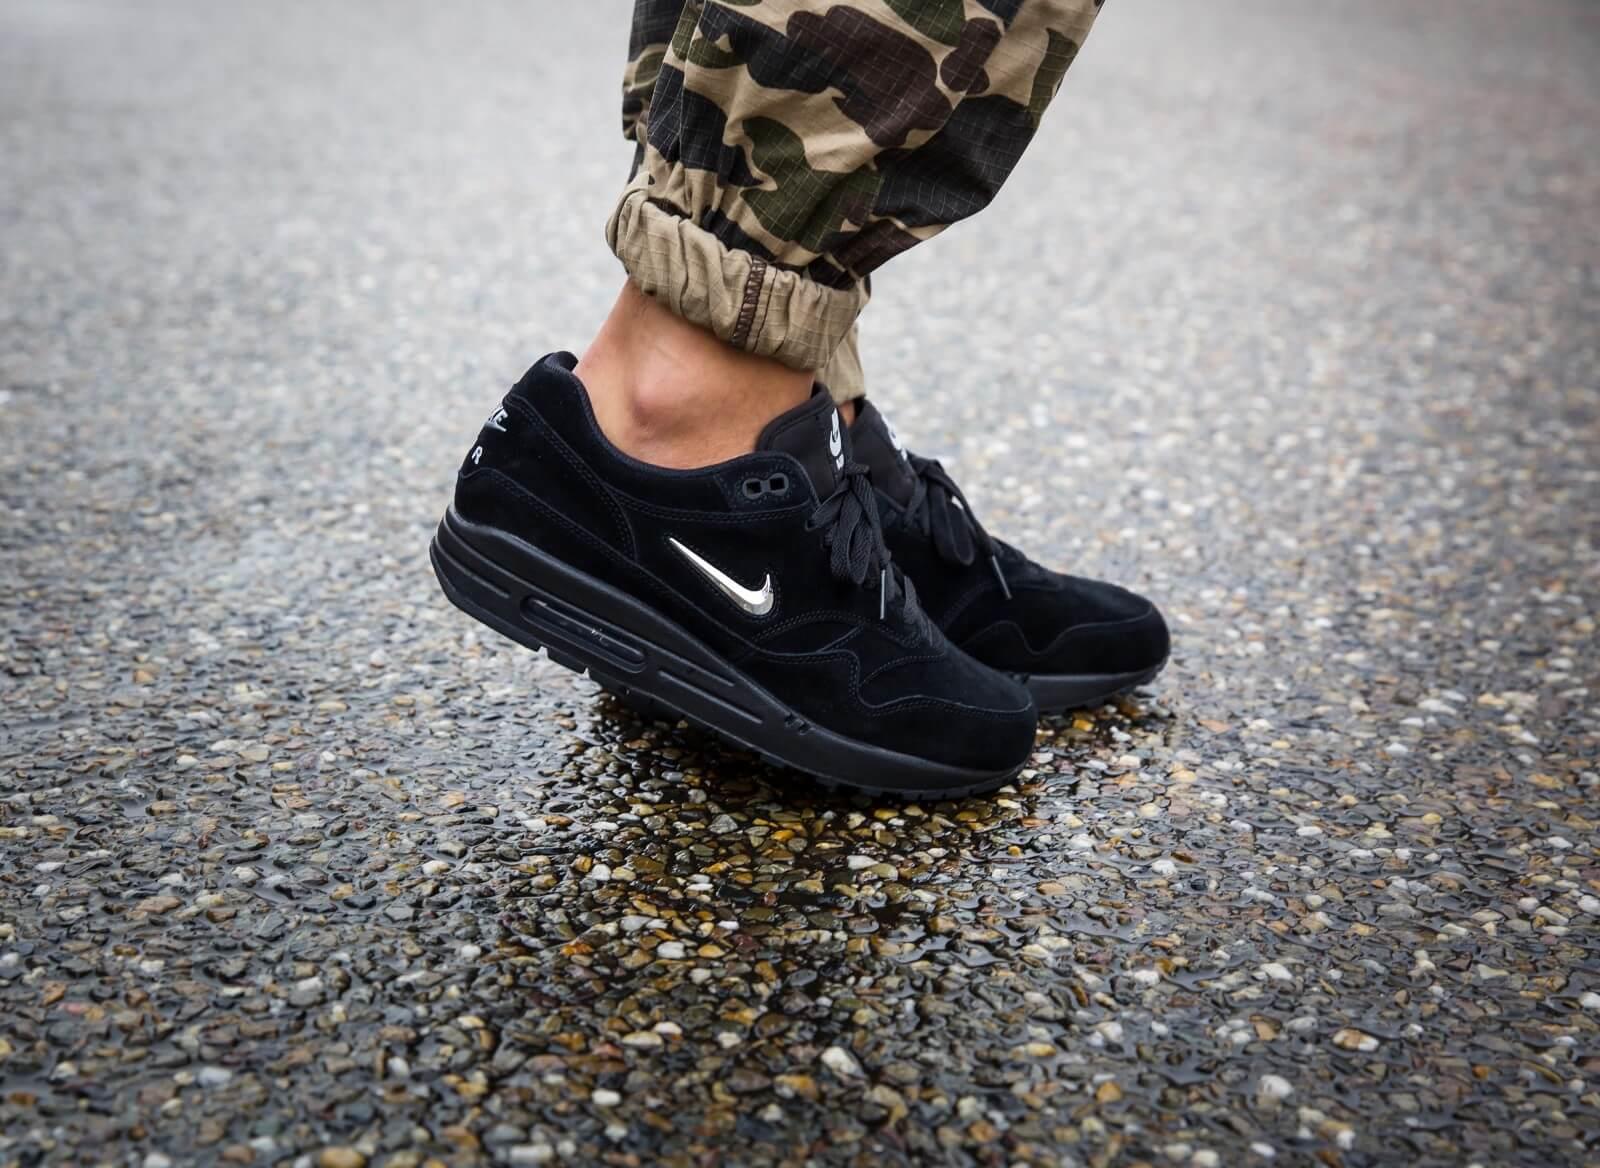 Nike Air Max 1 Premium SC Black/Chrome